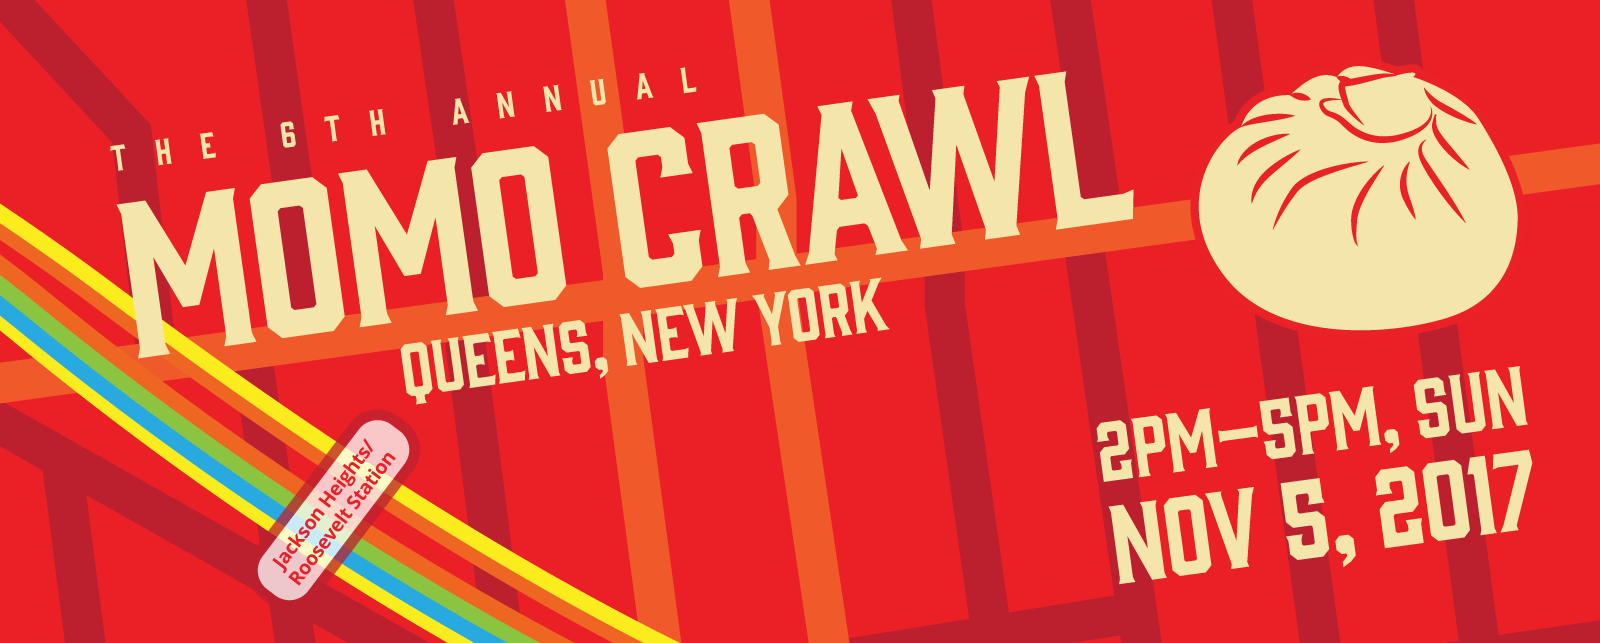 momo-crawl-nyc-2017-banner-jackson-heights